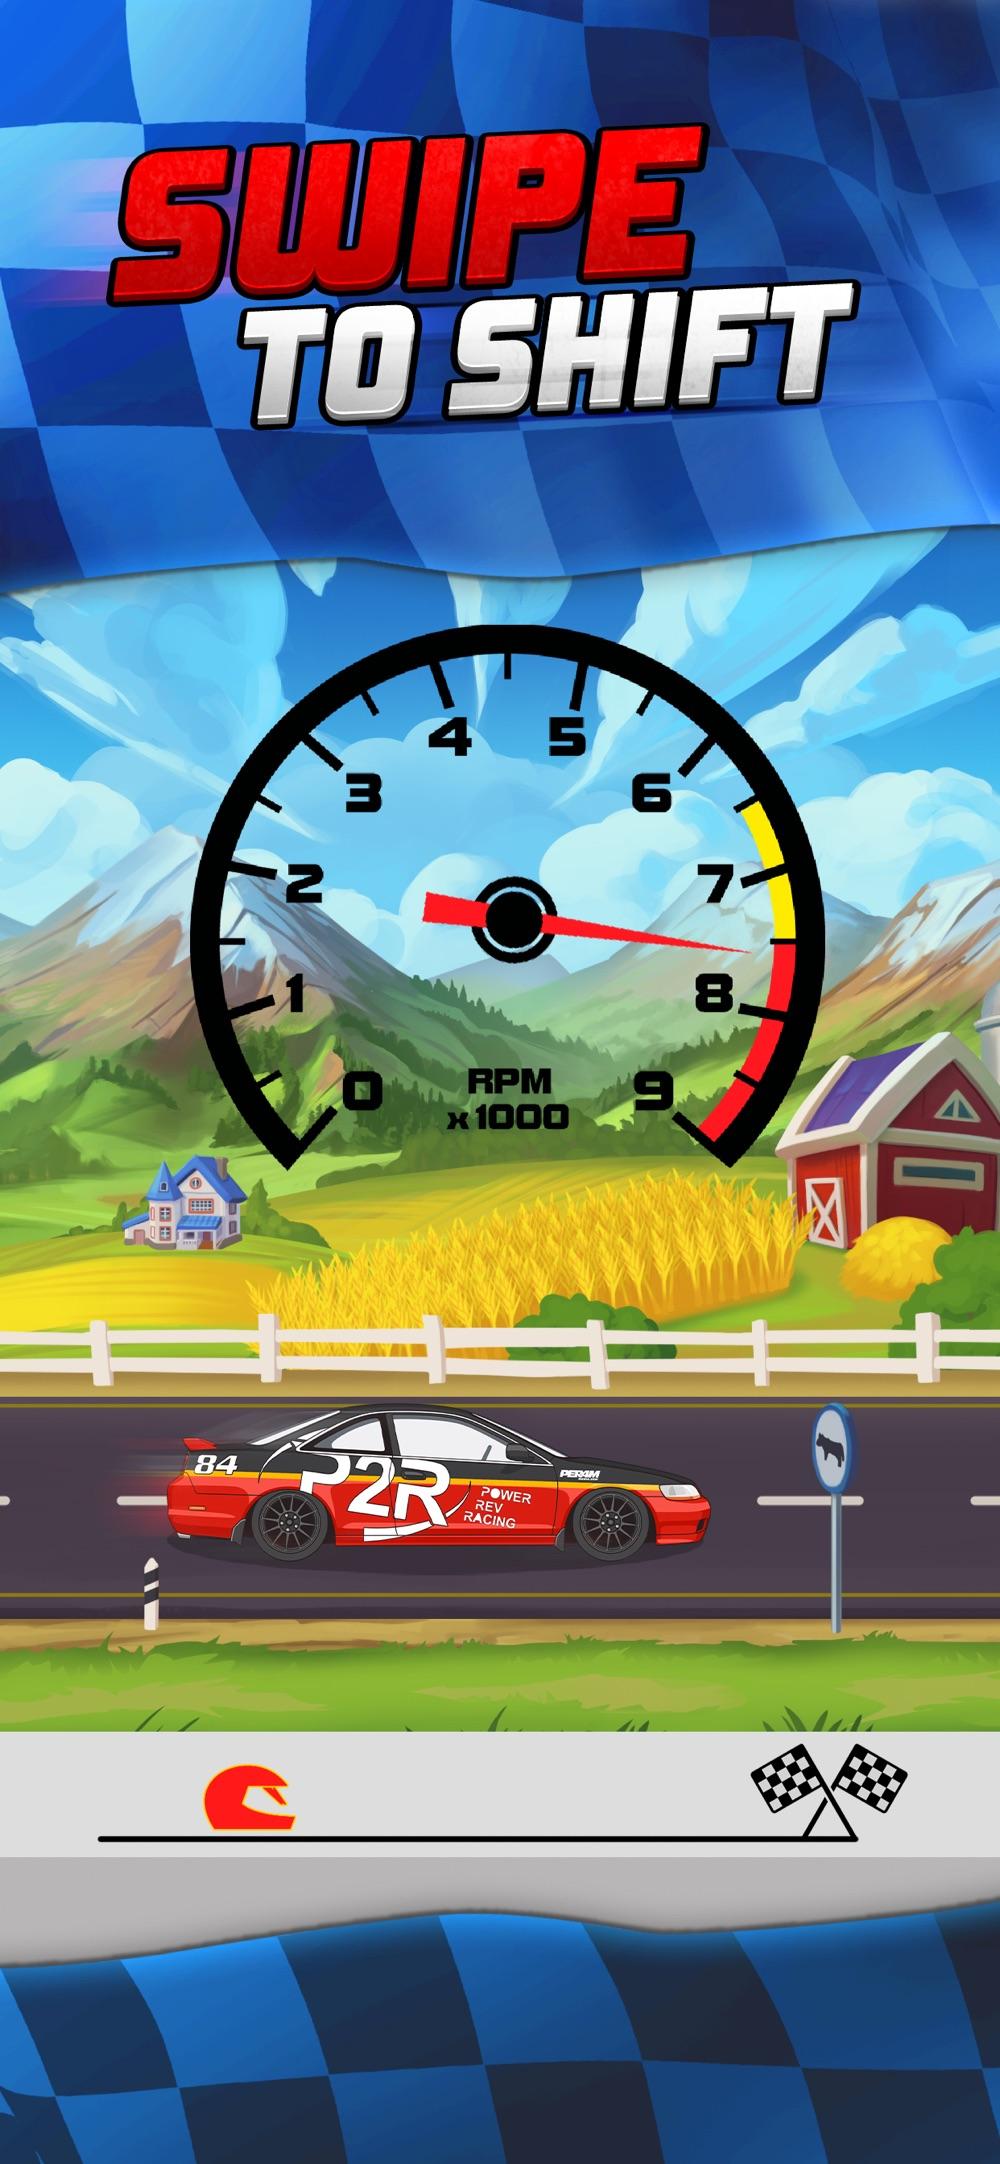 P2R Power Rev Racing Cheat Codes